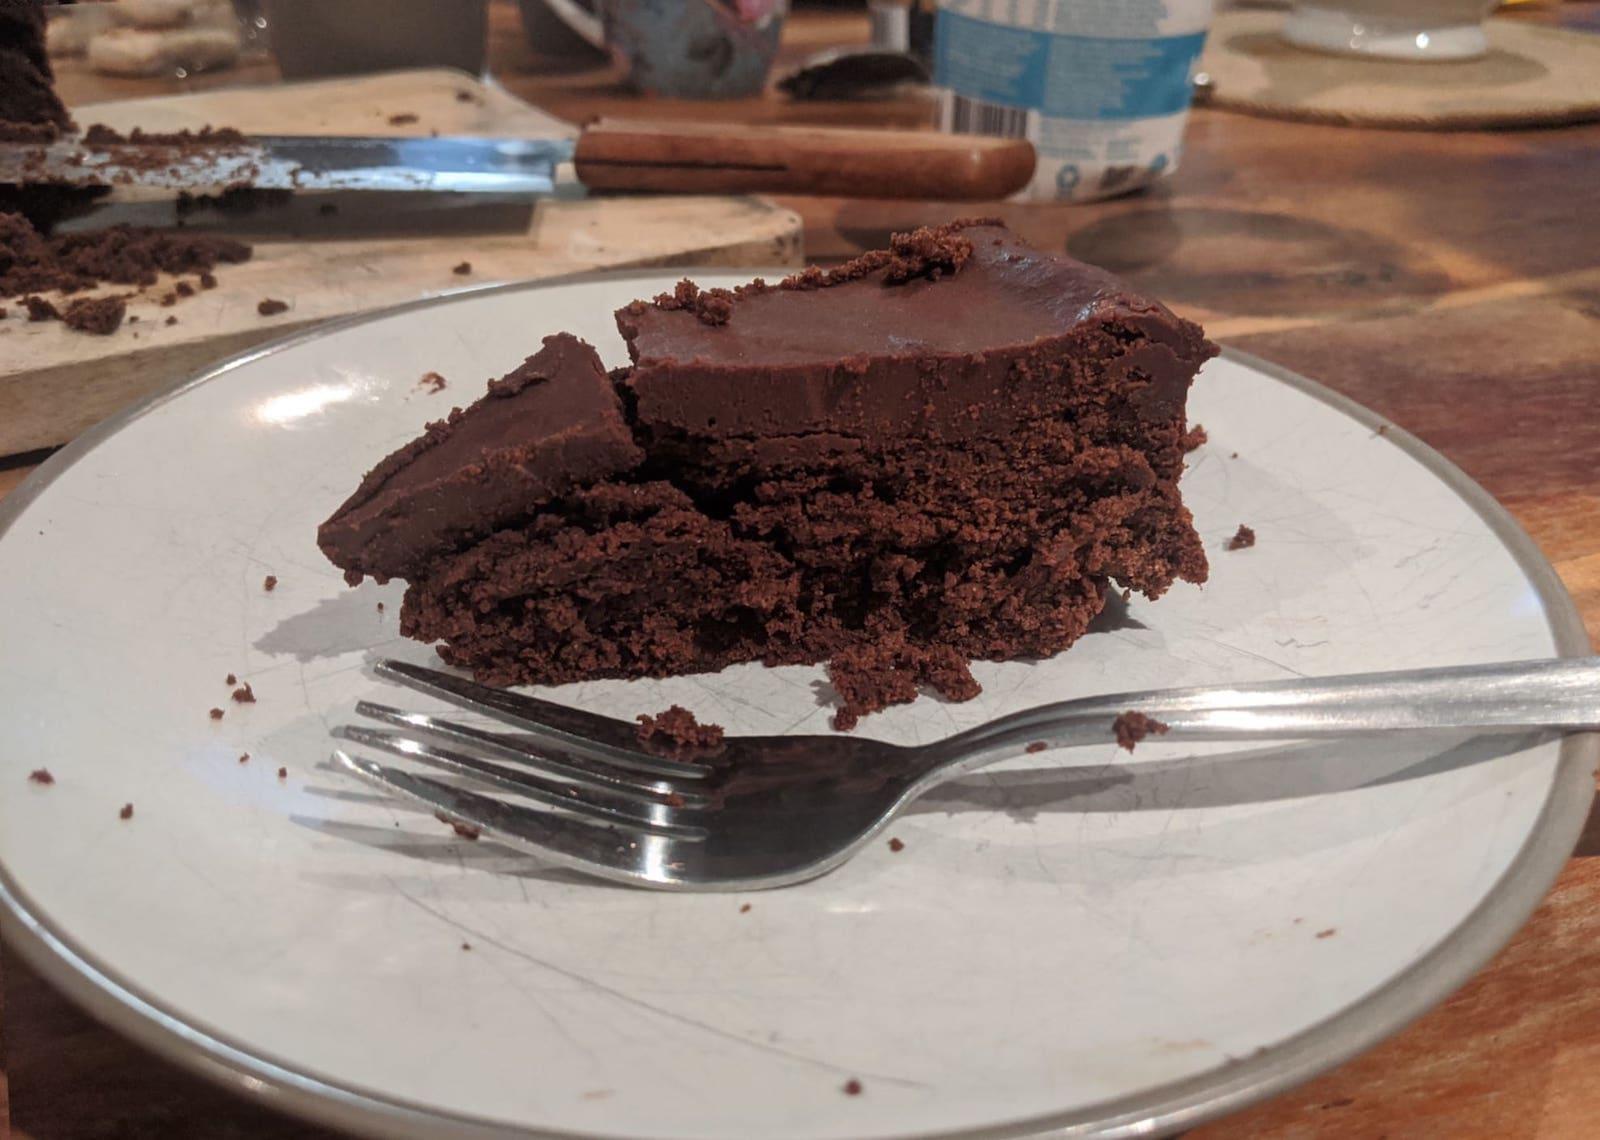 Making Tartine's Chocolate Mousse Cake at Home